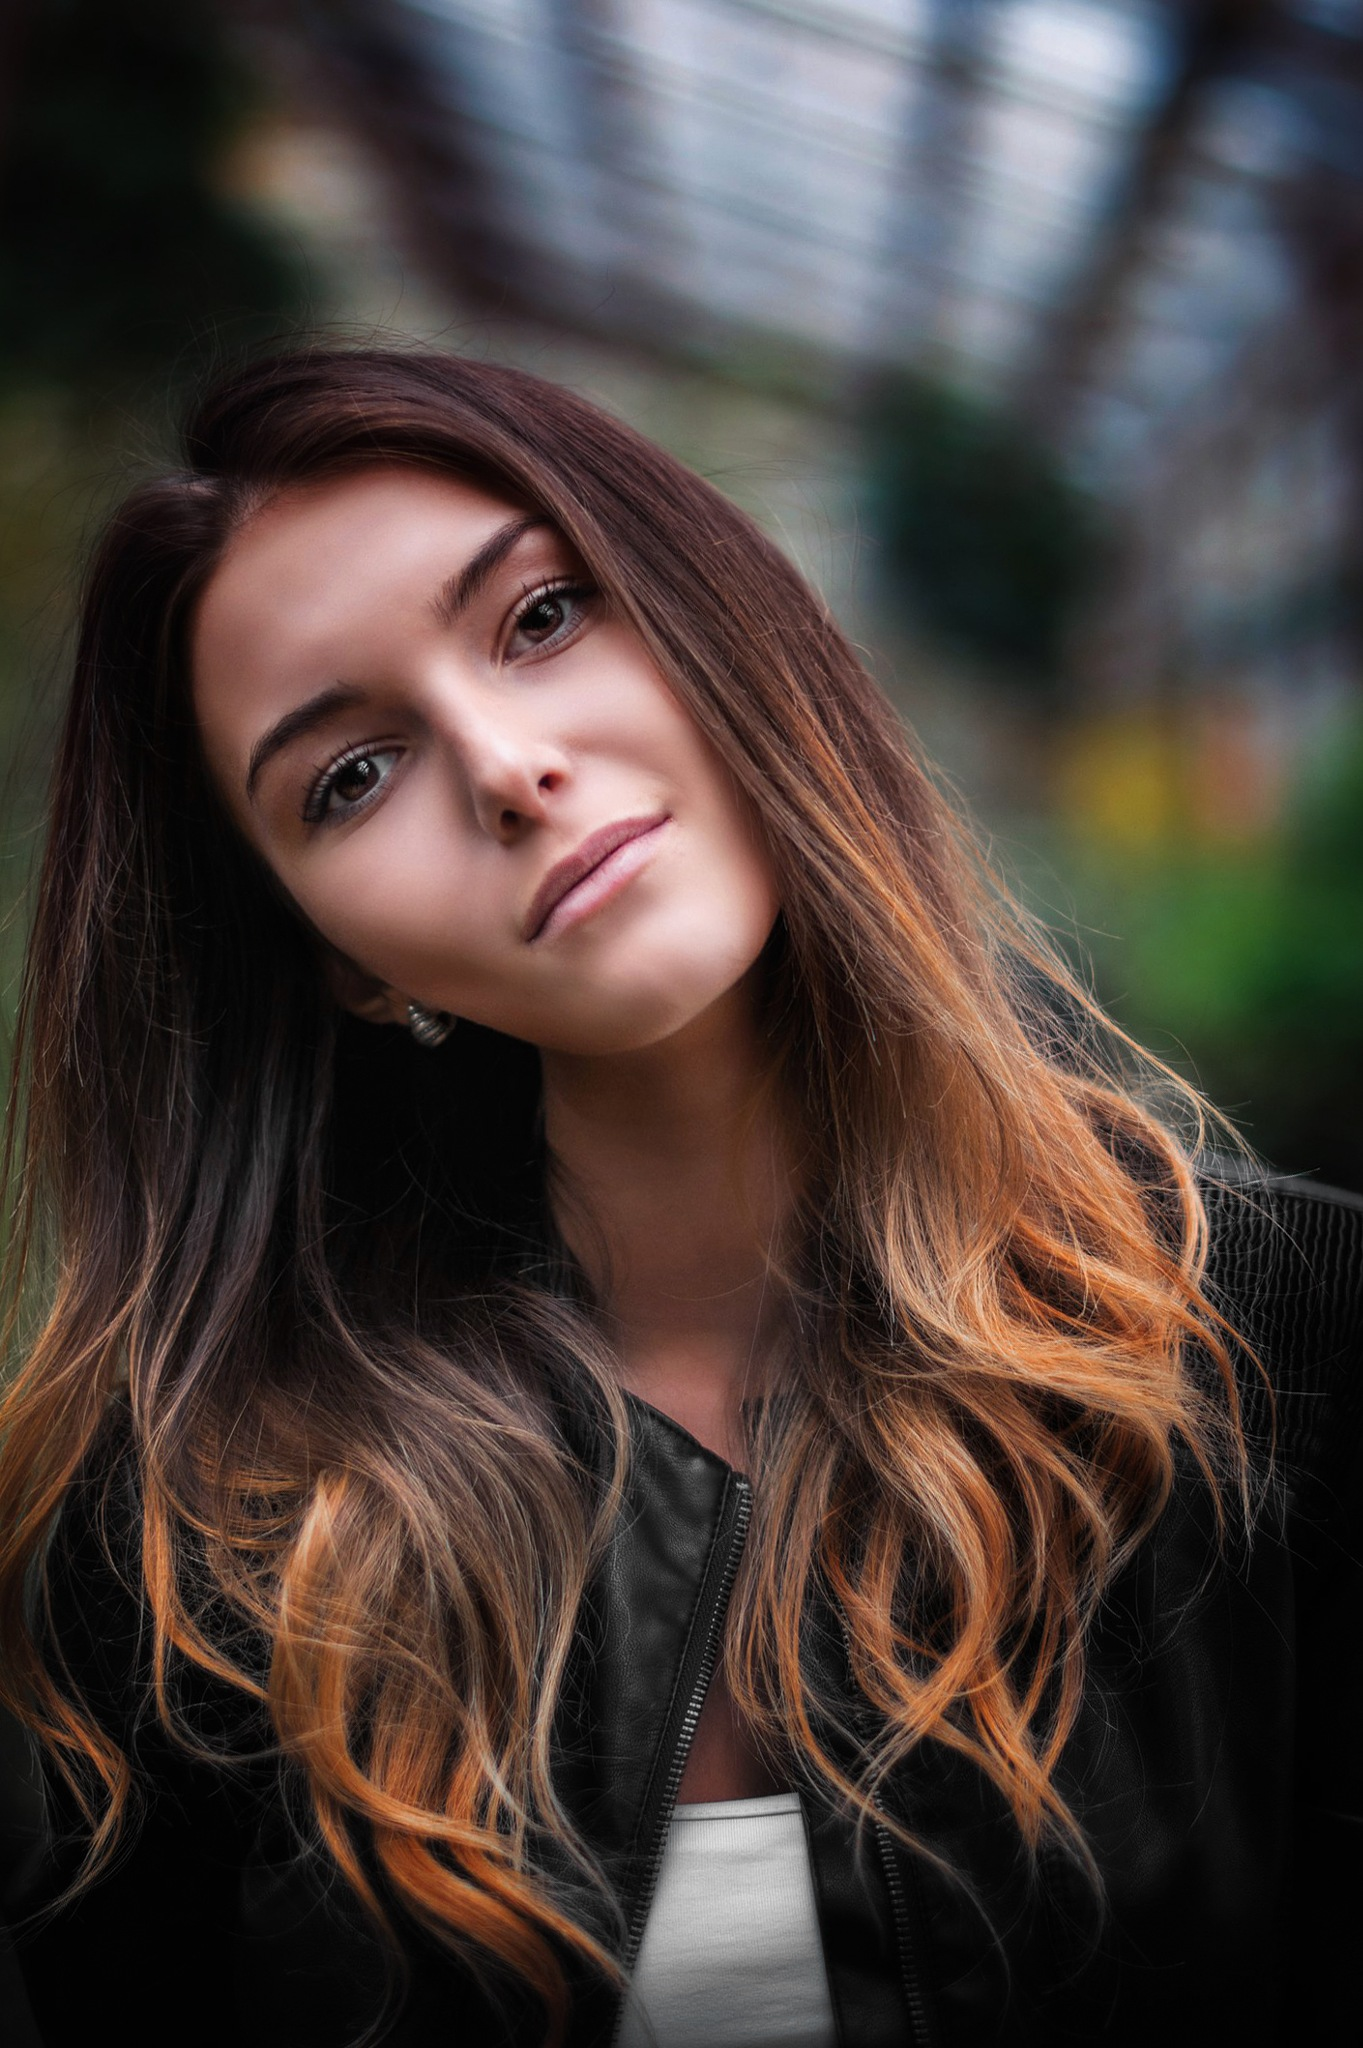 Serbian girl by Roman Alyabev